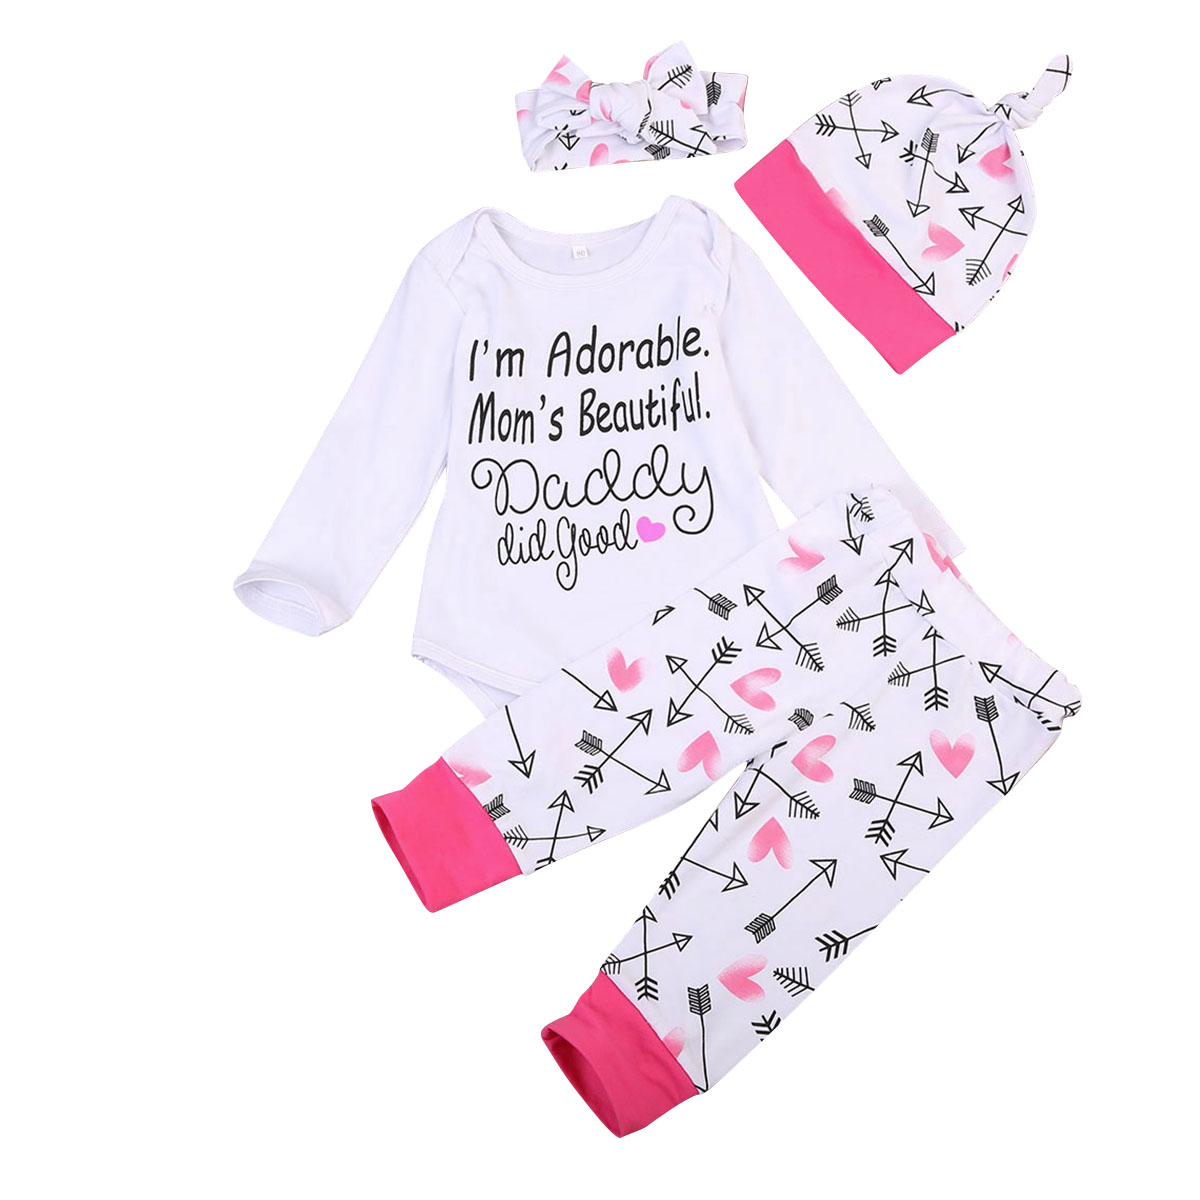 Active 4pcs Per Set Newborn Baby Girls Long Sleeve Romper Tops Pants Home Outfits Set Clothes